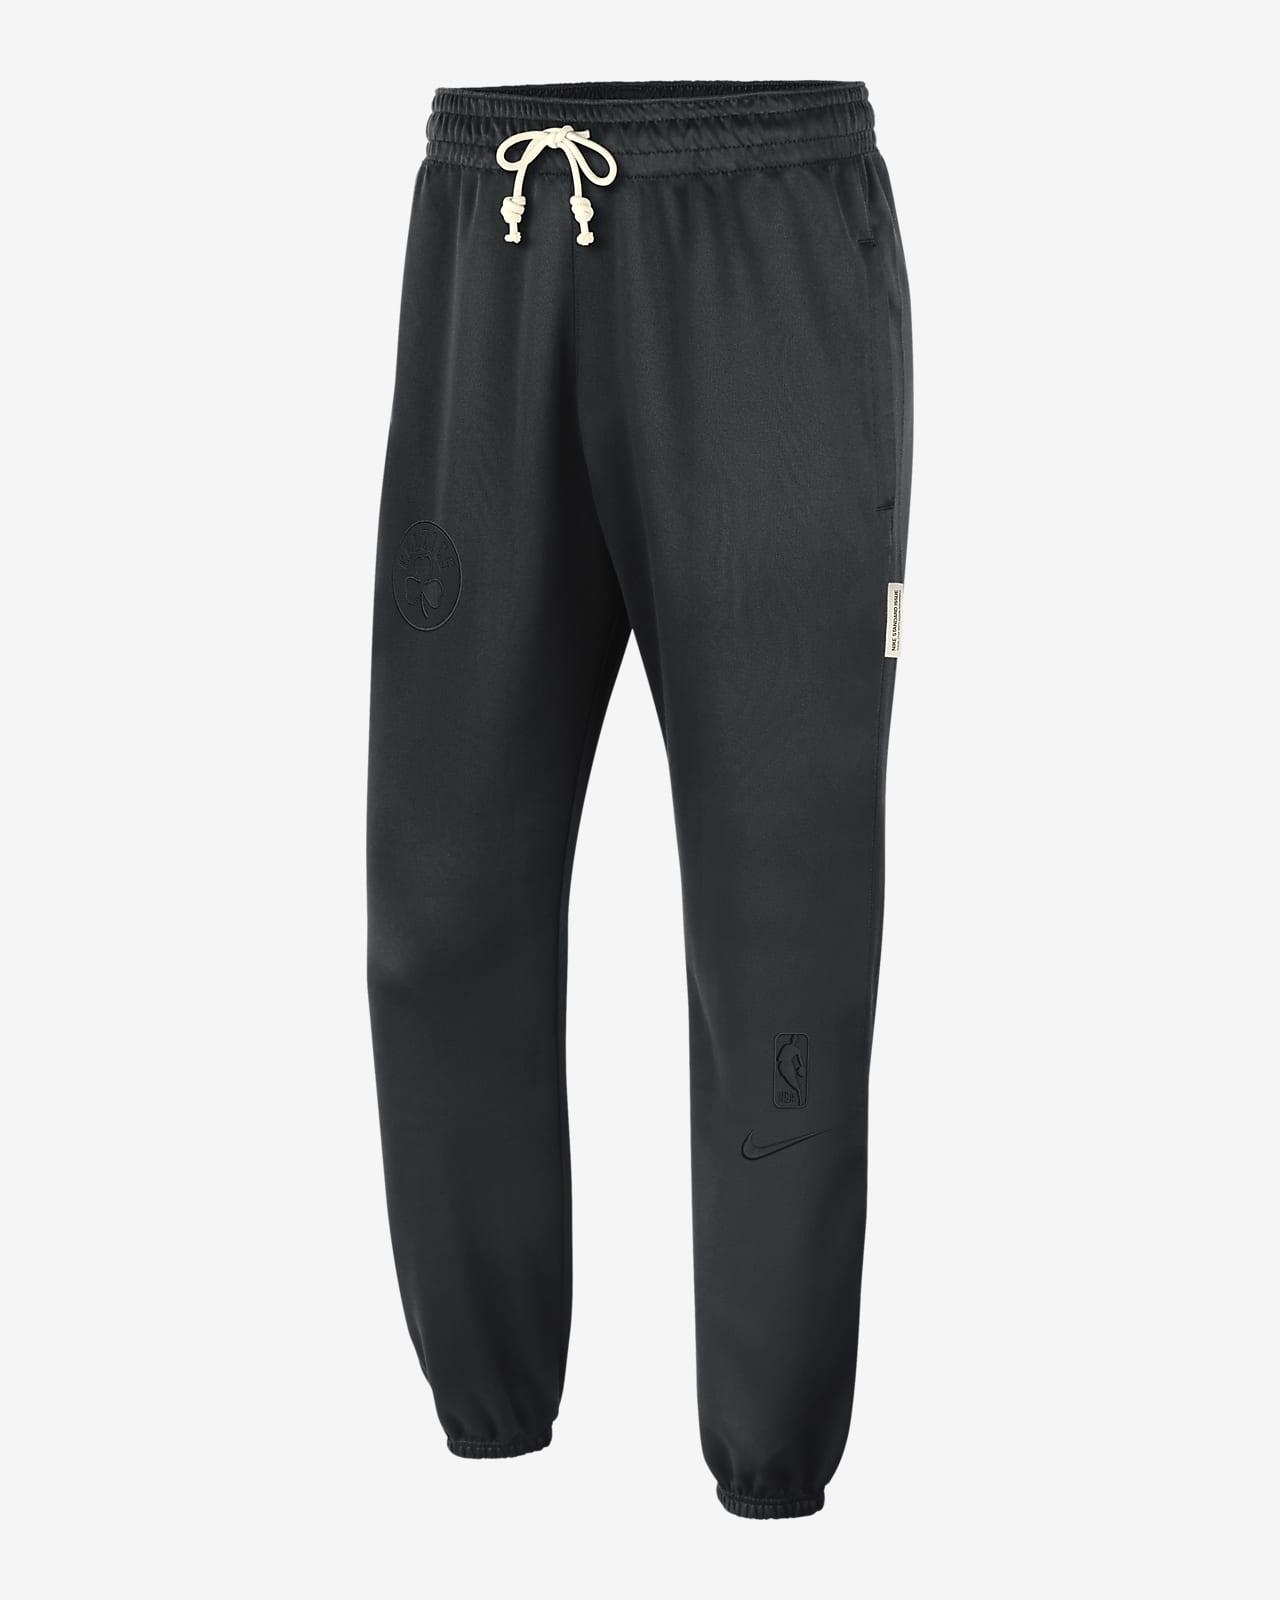 Celtics Standard Issue Men's Nike Dri-FIT NBA Pants